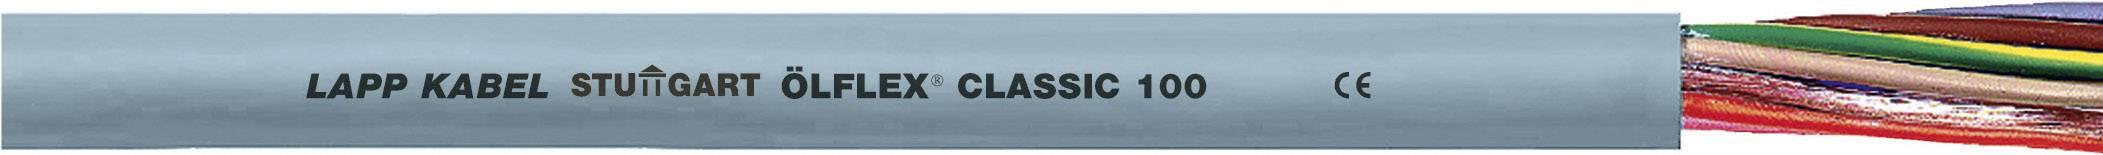 Kabel LappKabel Ölflex CLASSIC 100 10G0,5 (0010007), PVC, 8,6 mm, 500 V, šedá, 300 m